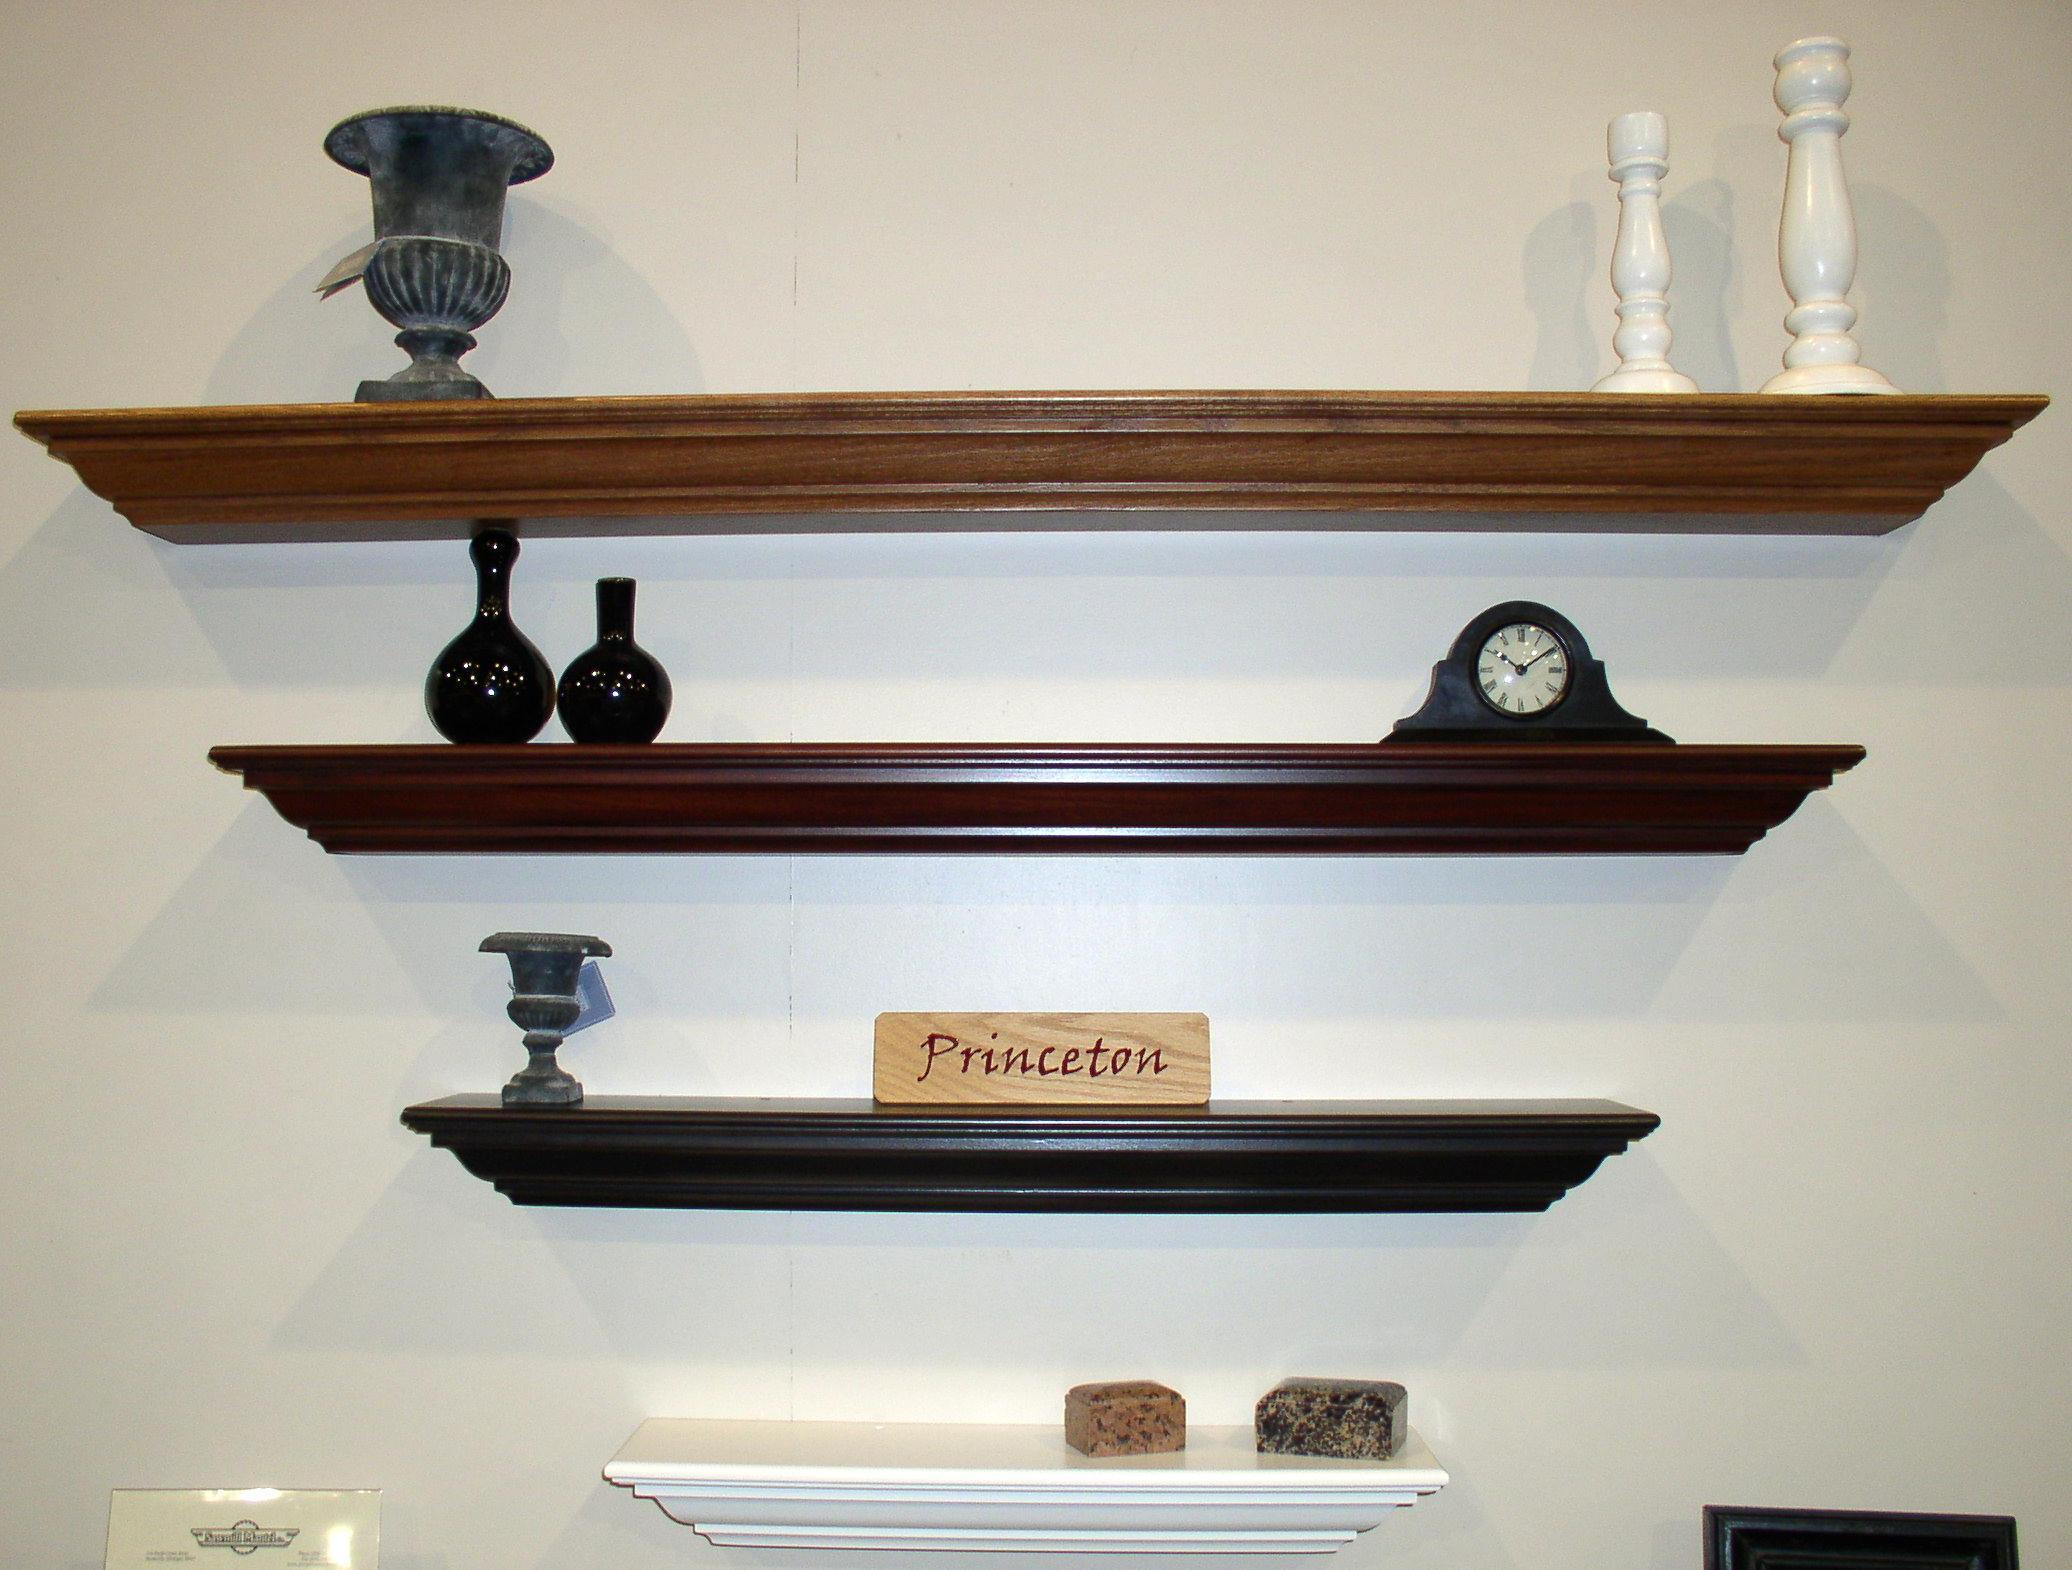 & Decorative kitchen shelves     Kitchen ideas